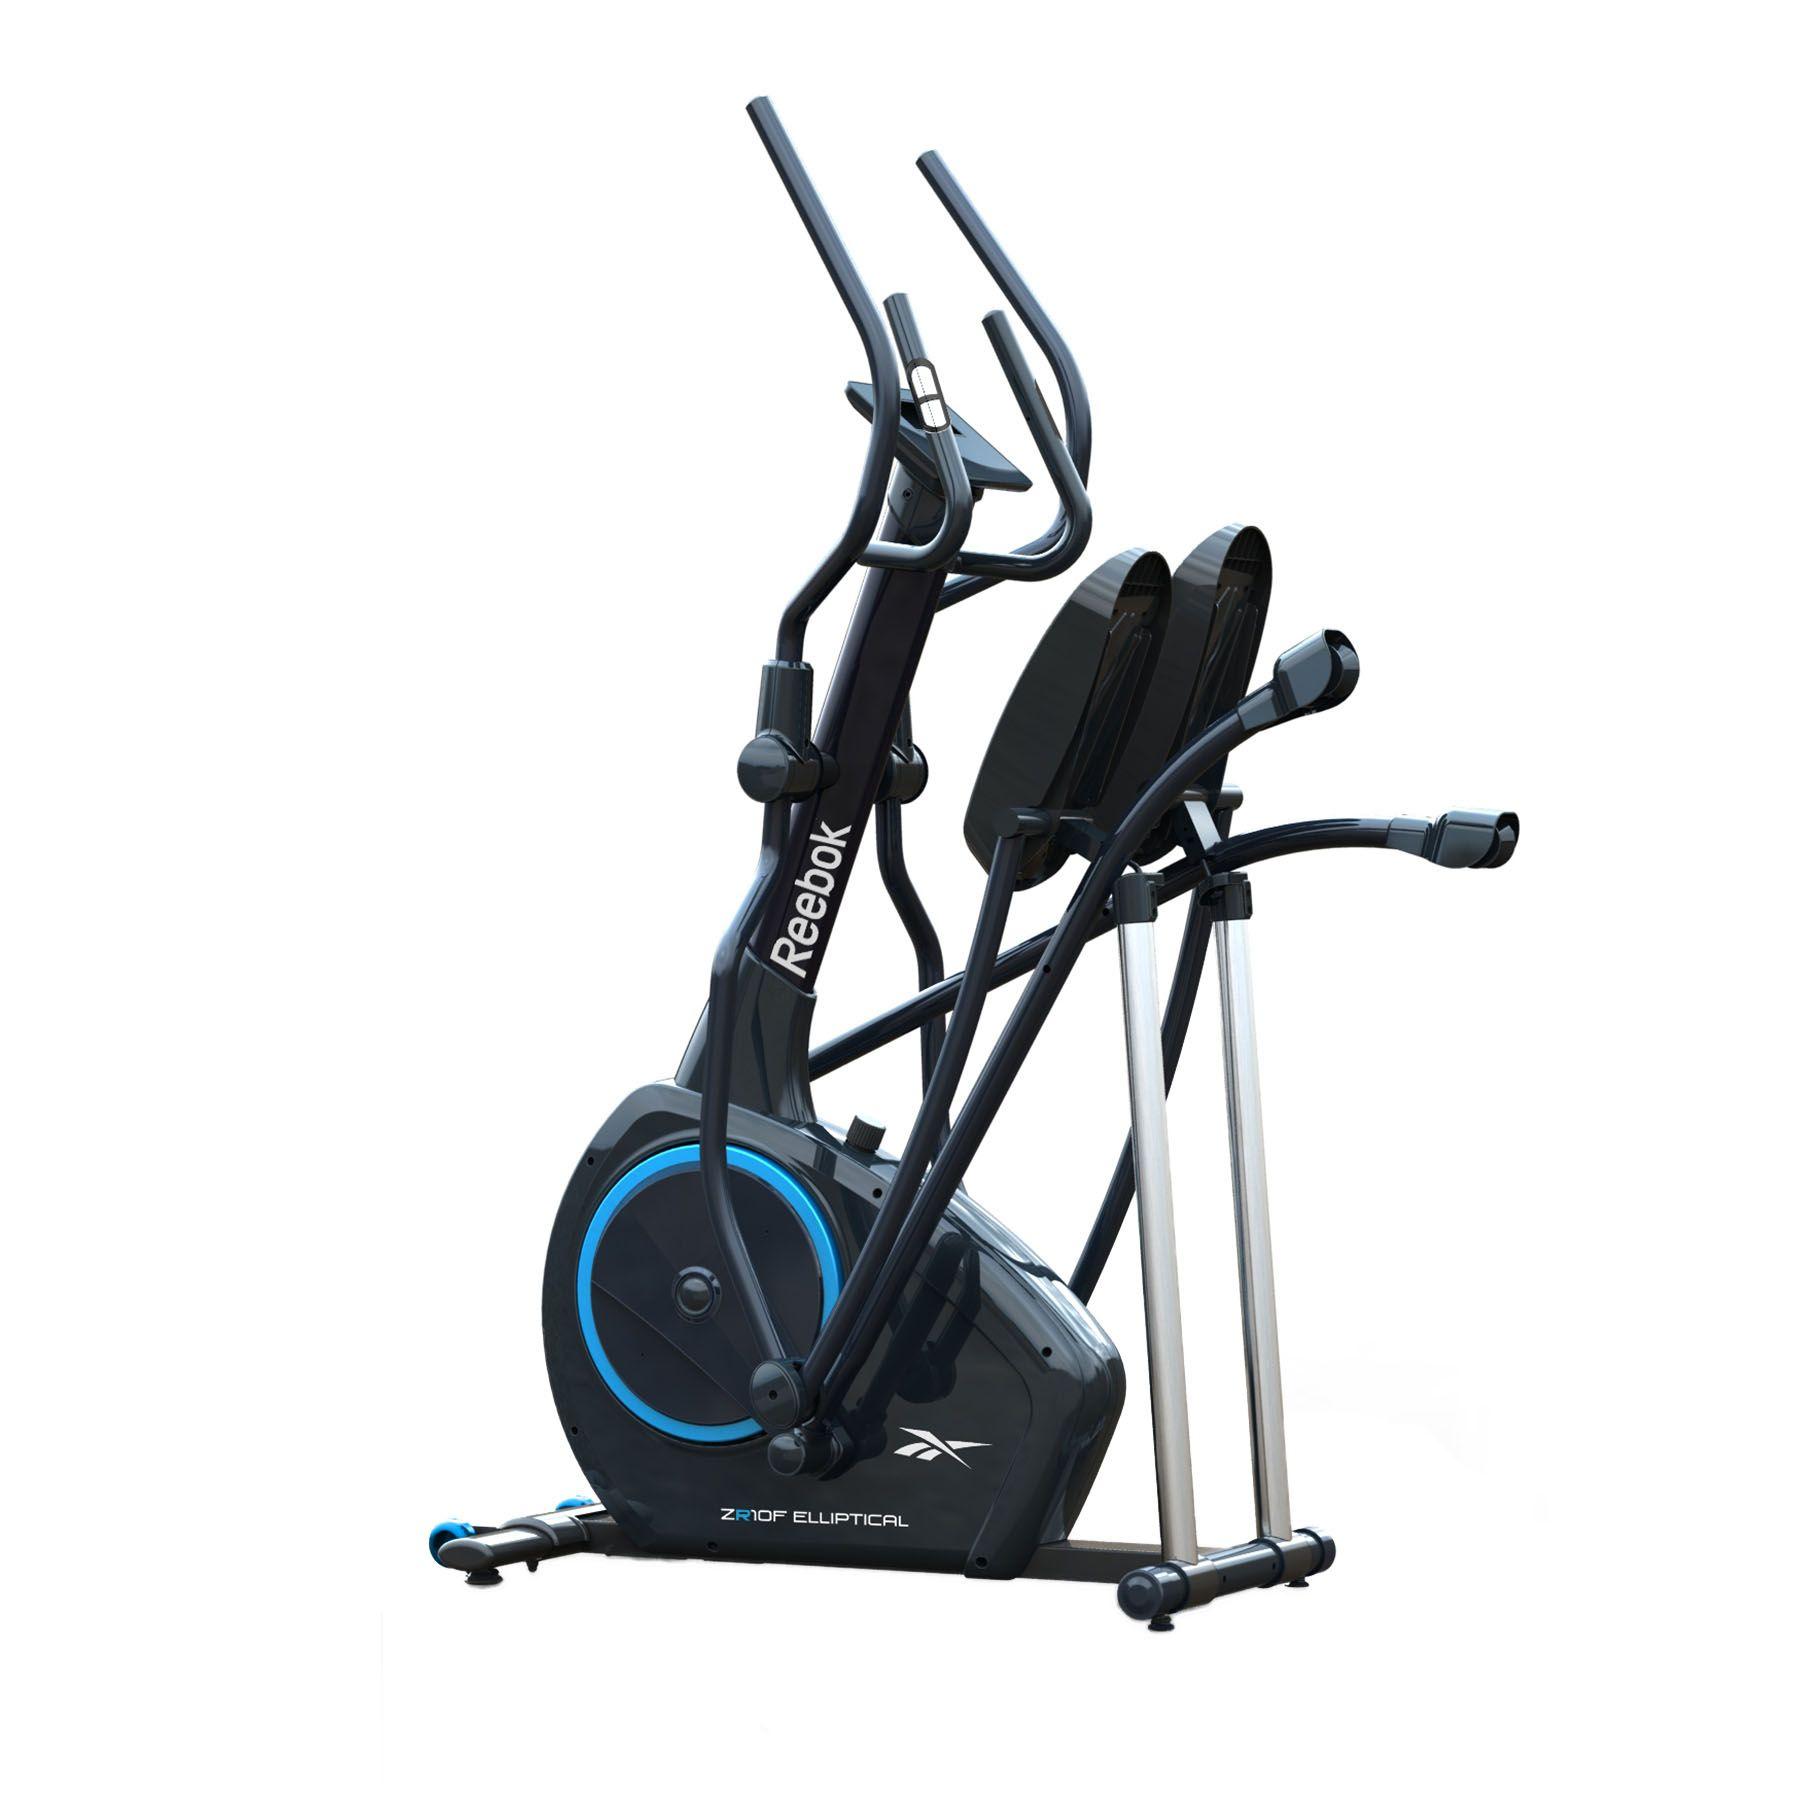 Reebok Zr10f Elliptical Cross Trainer Sweatband Com